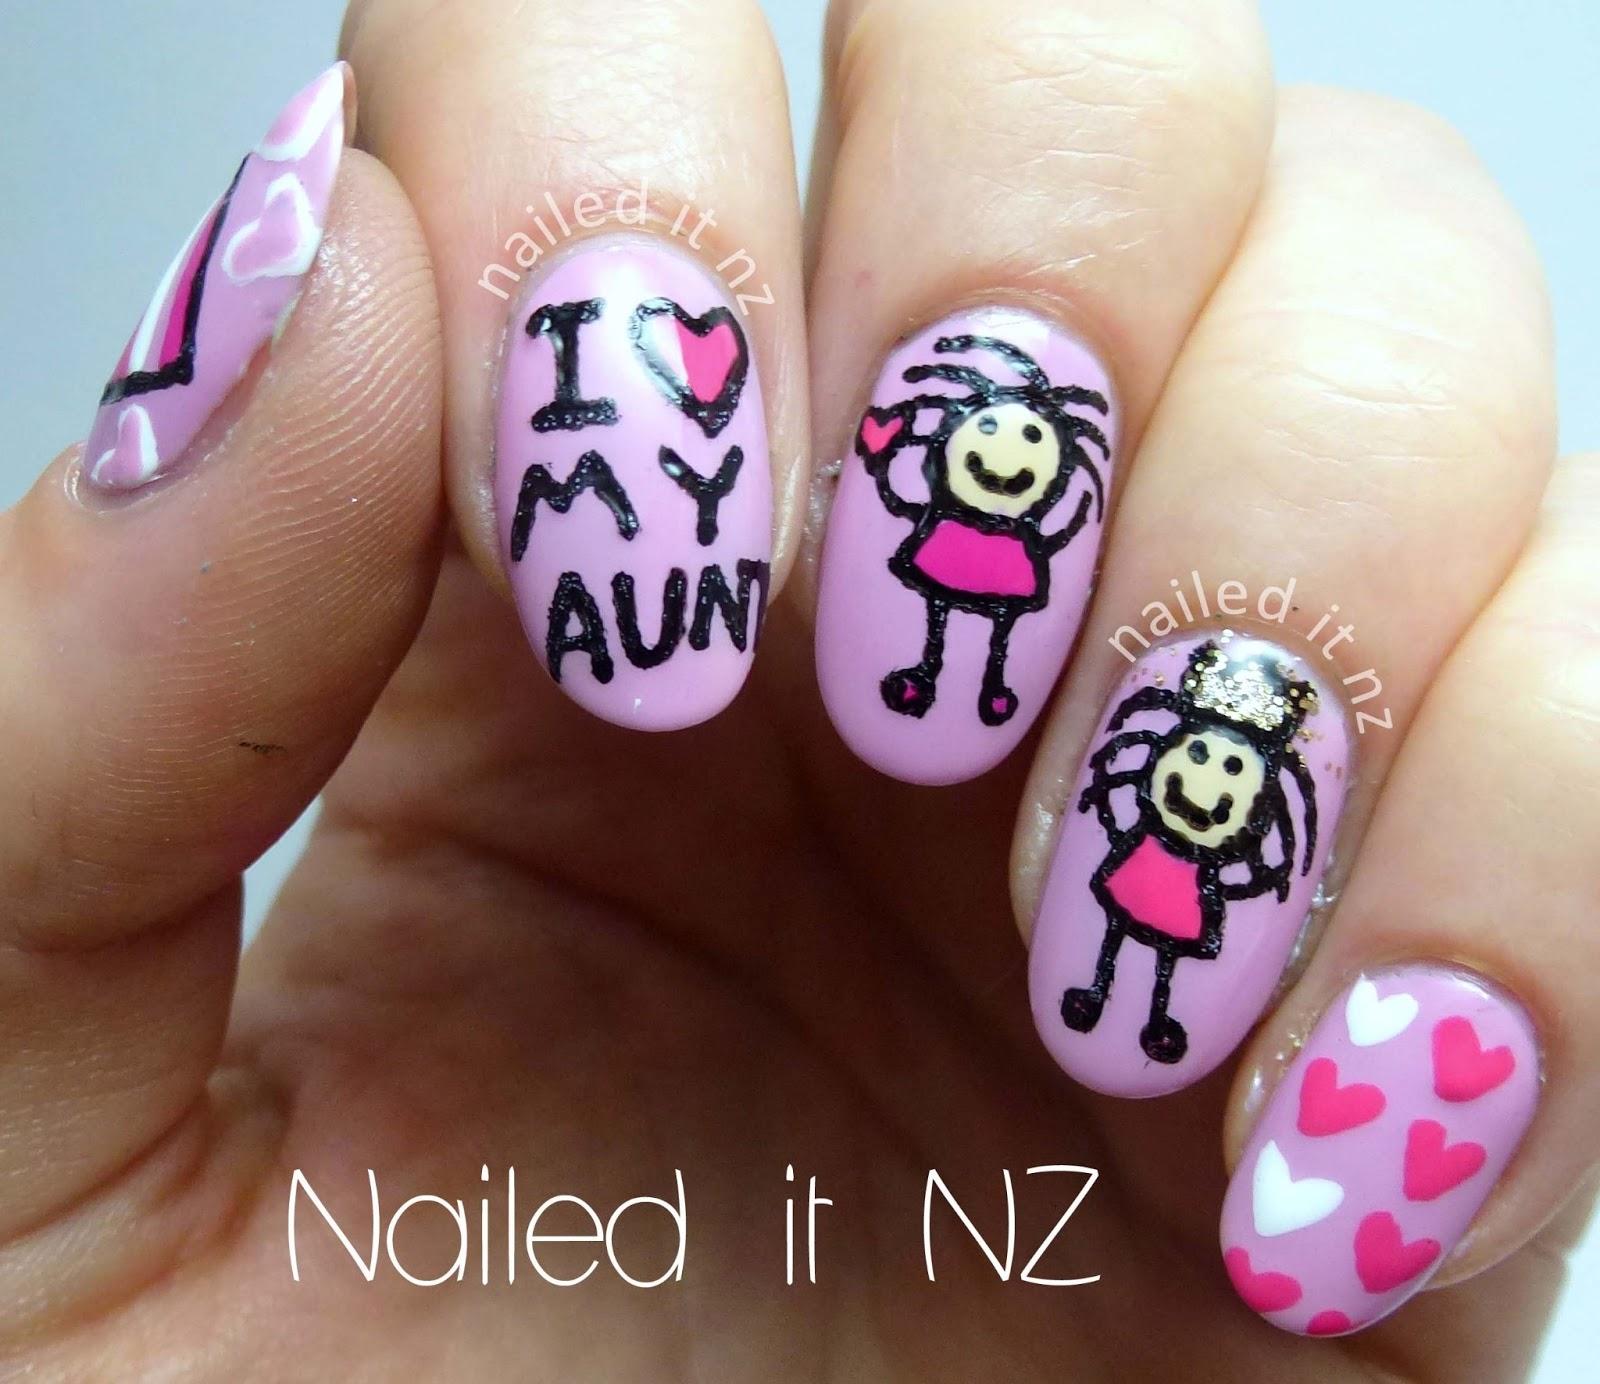 I love my Aunt nails!